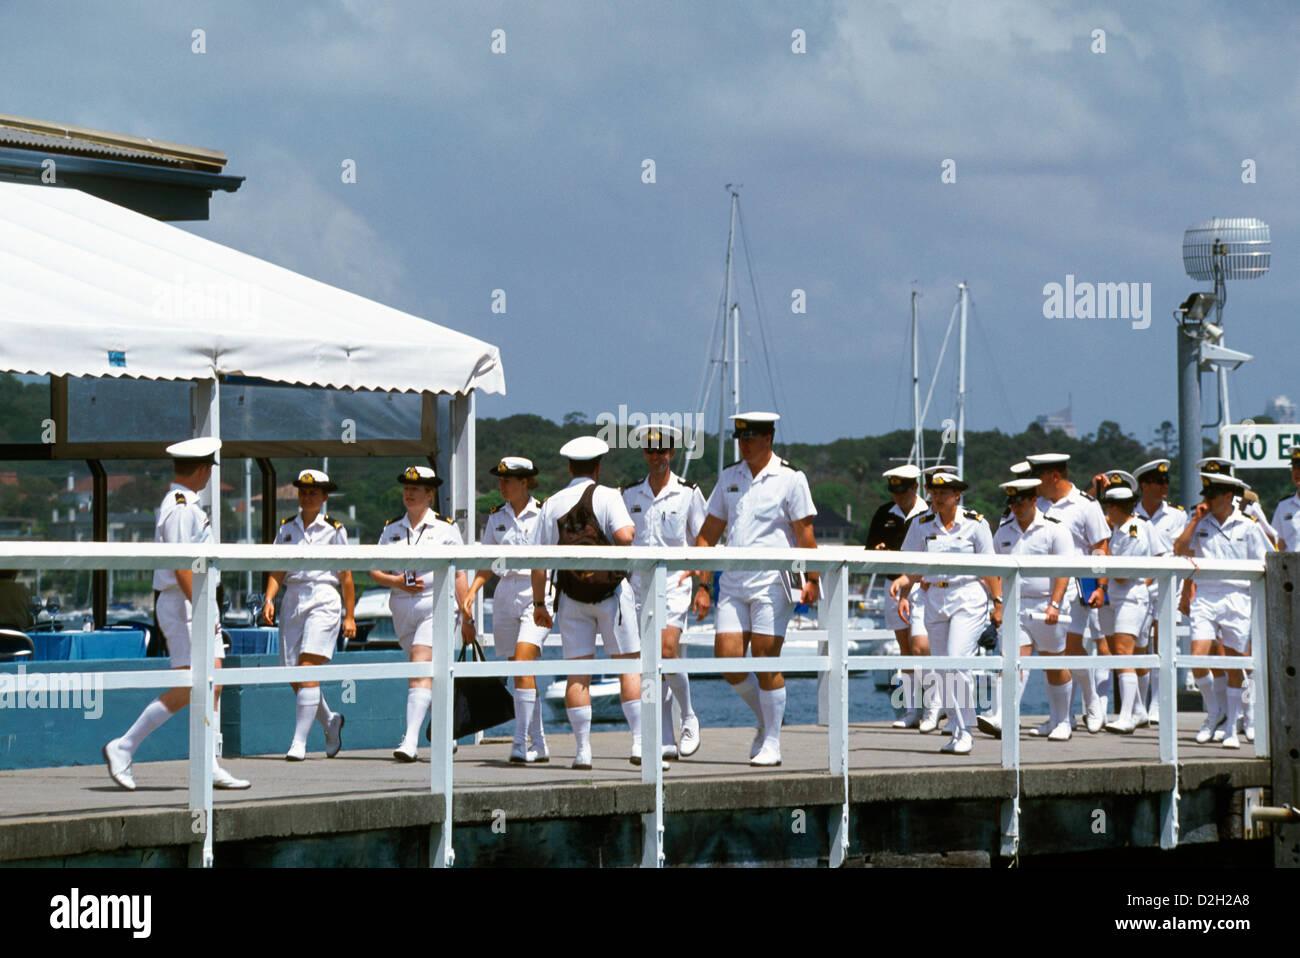 Sydney New South Wales Australia Watson's Bay Sailors On Pier - Stock Image